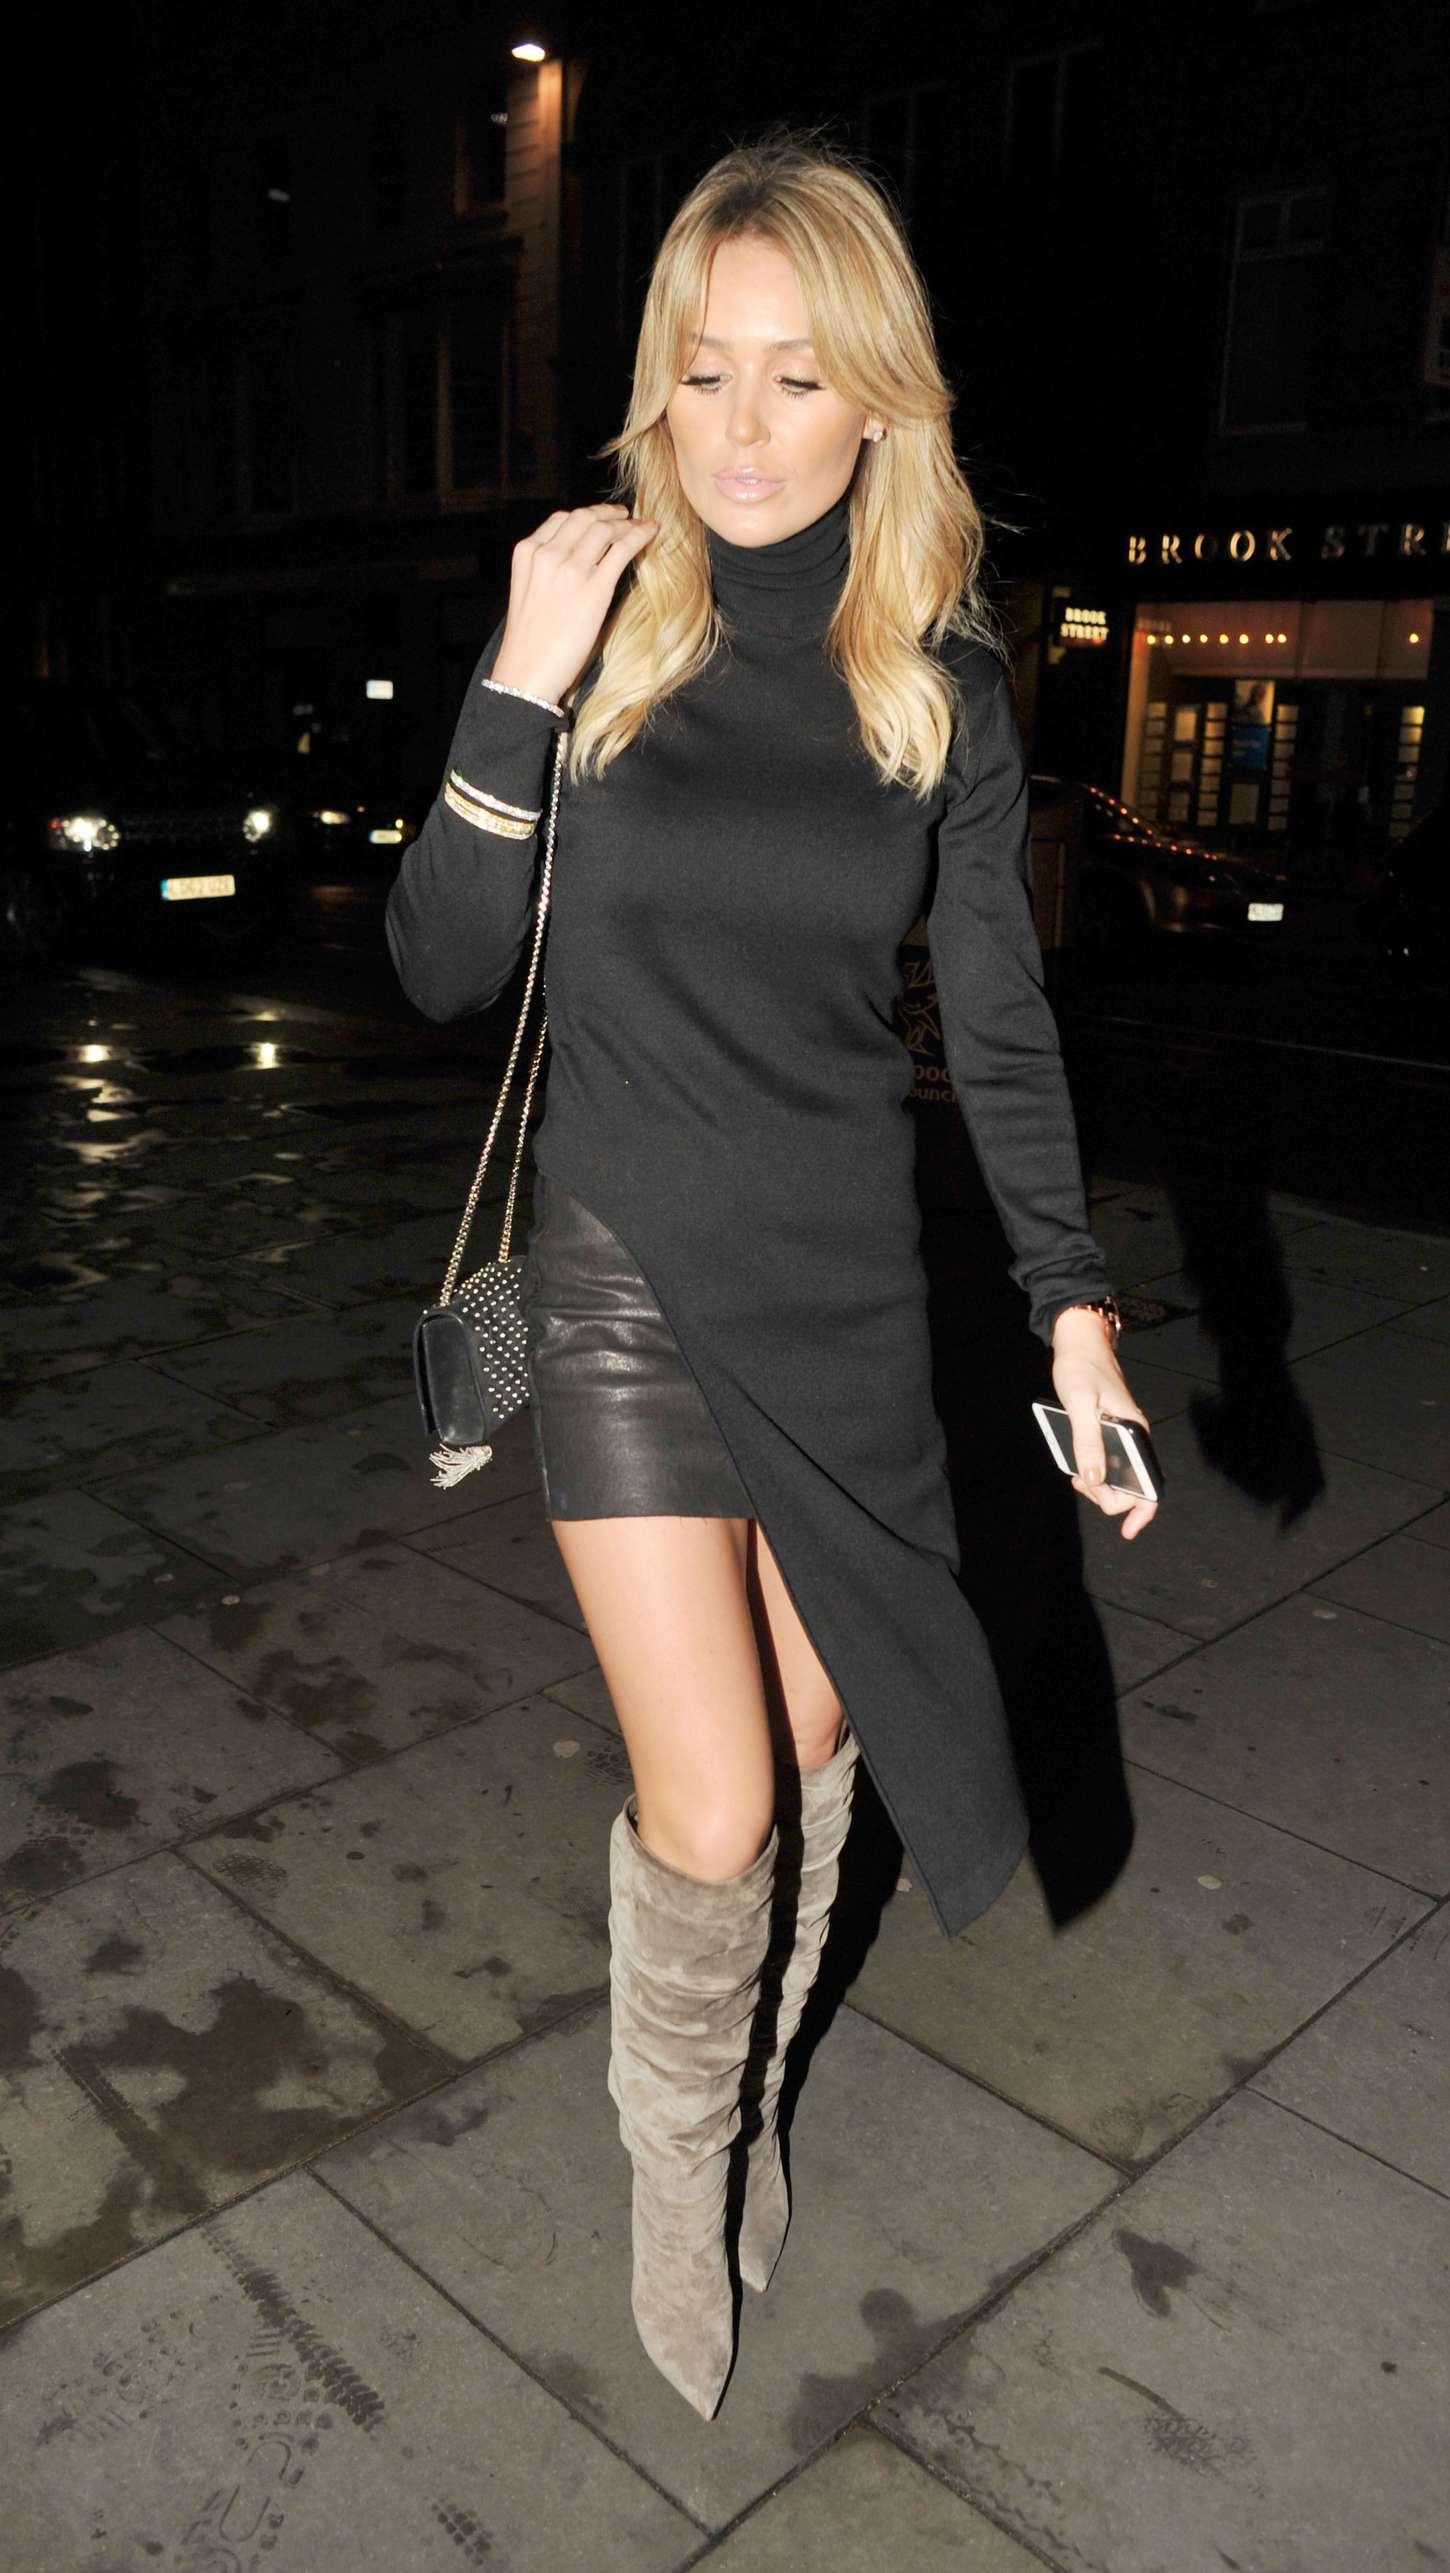 Alex gerrard in black dress out in liverpool